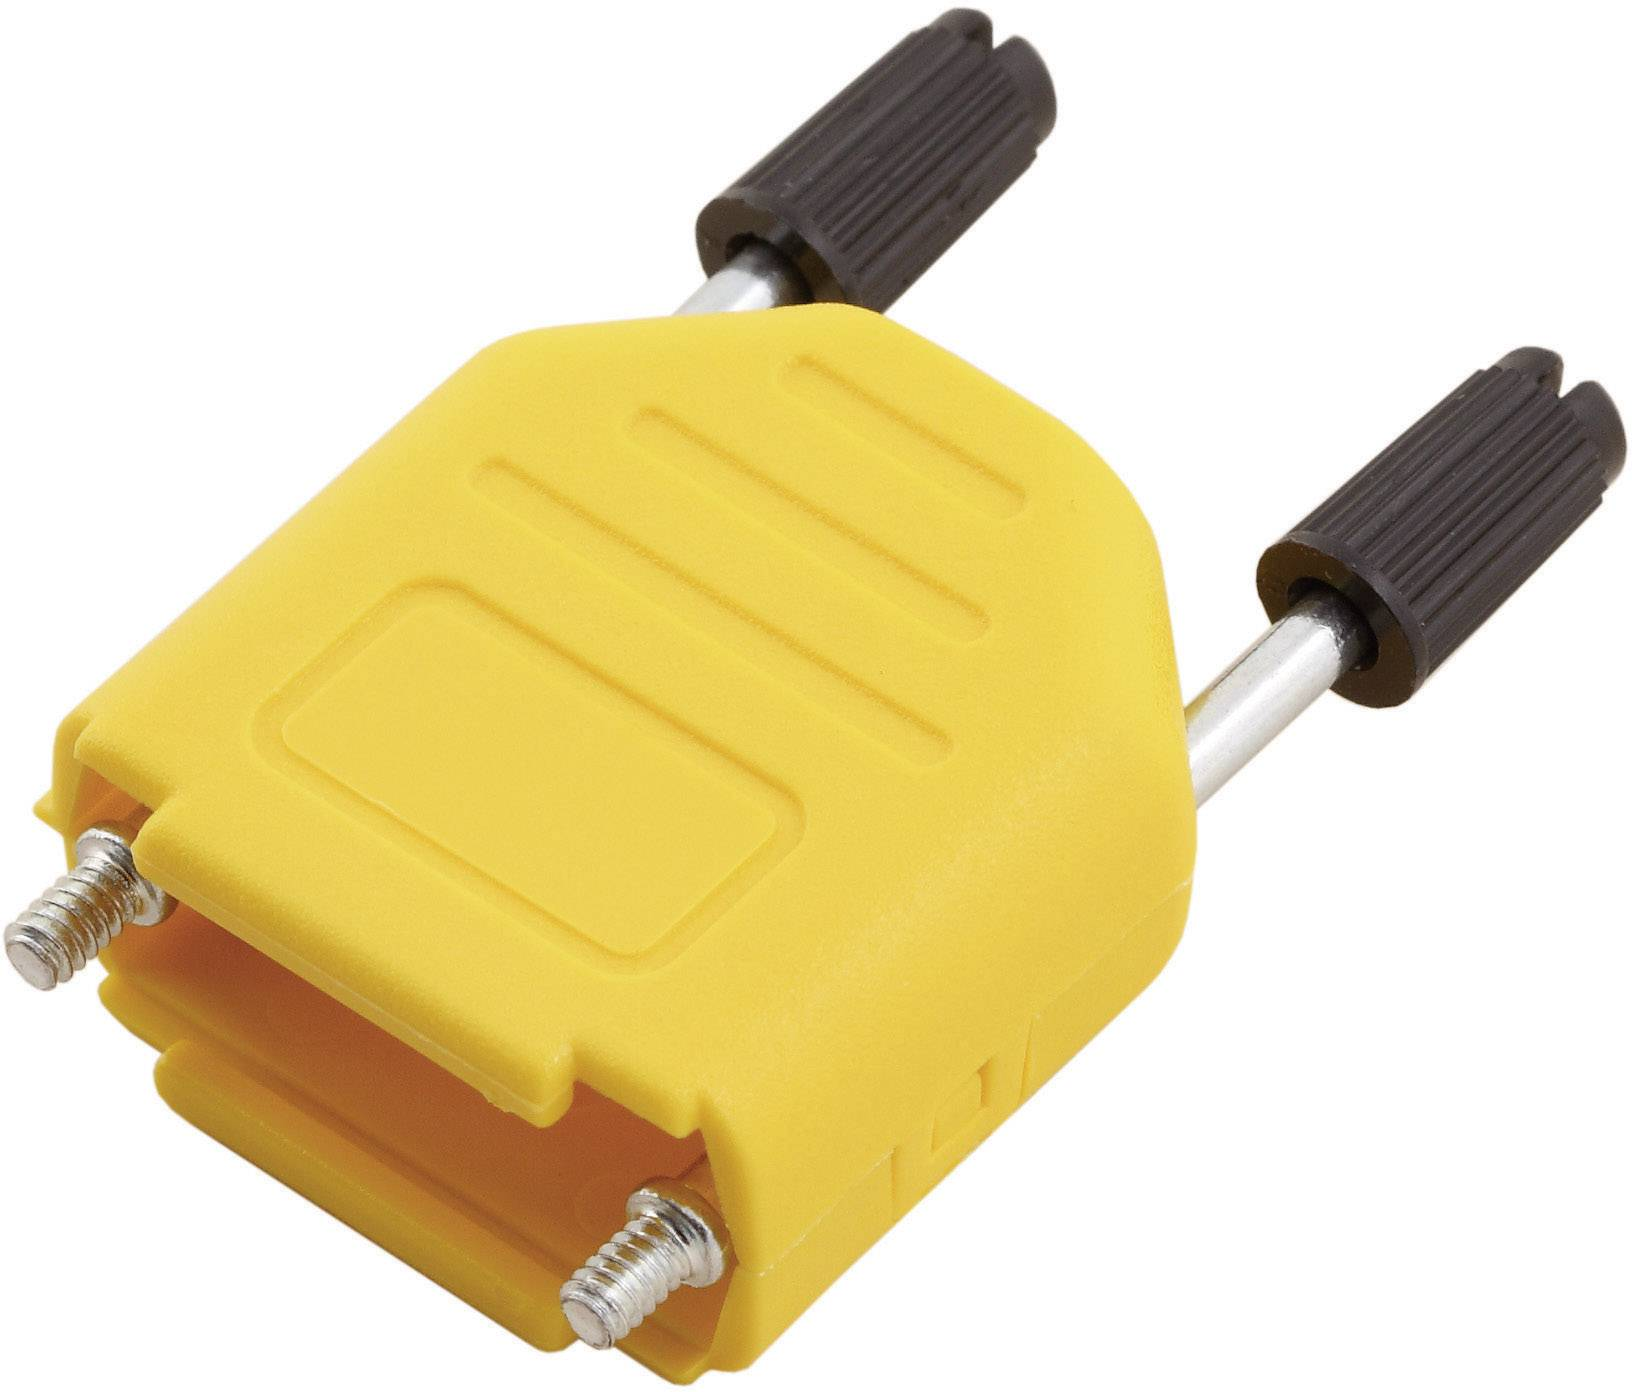 D-SUB púzdro MH Connectors MHDPPK09-Y-K 6353-0105-01, Počet pinov: 9, plast, 180 °, žltá, 1 ks